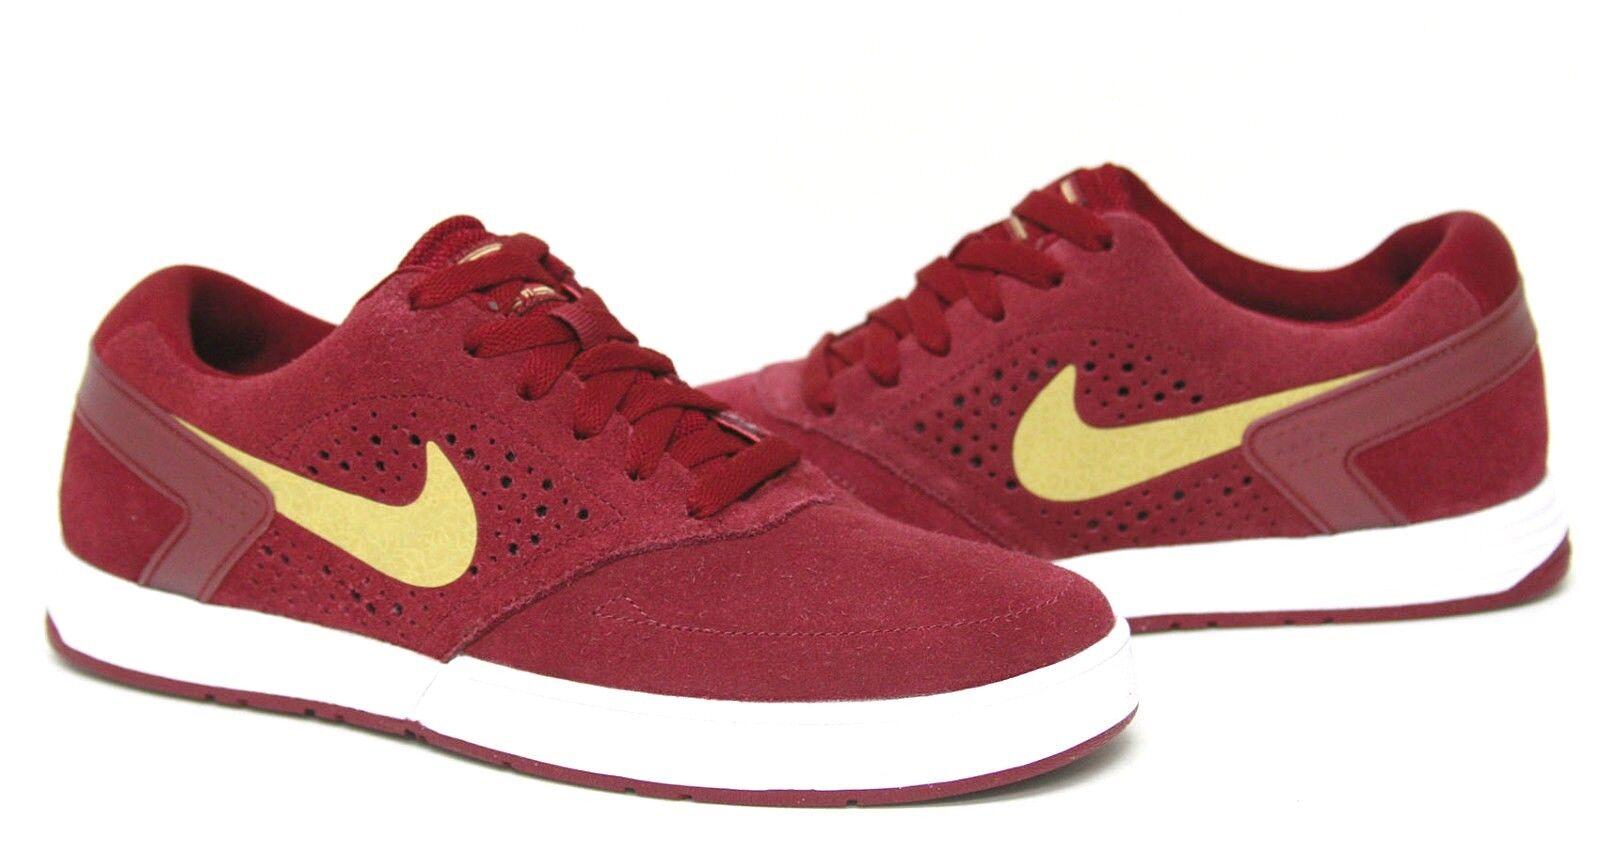 Nike Men's Shoes SB Paul Rodriguez 6 Skateboarding Shoe 525133~671 Men's Sz 7.5